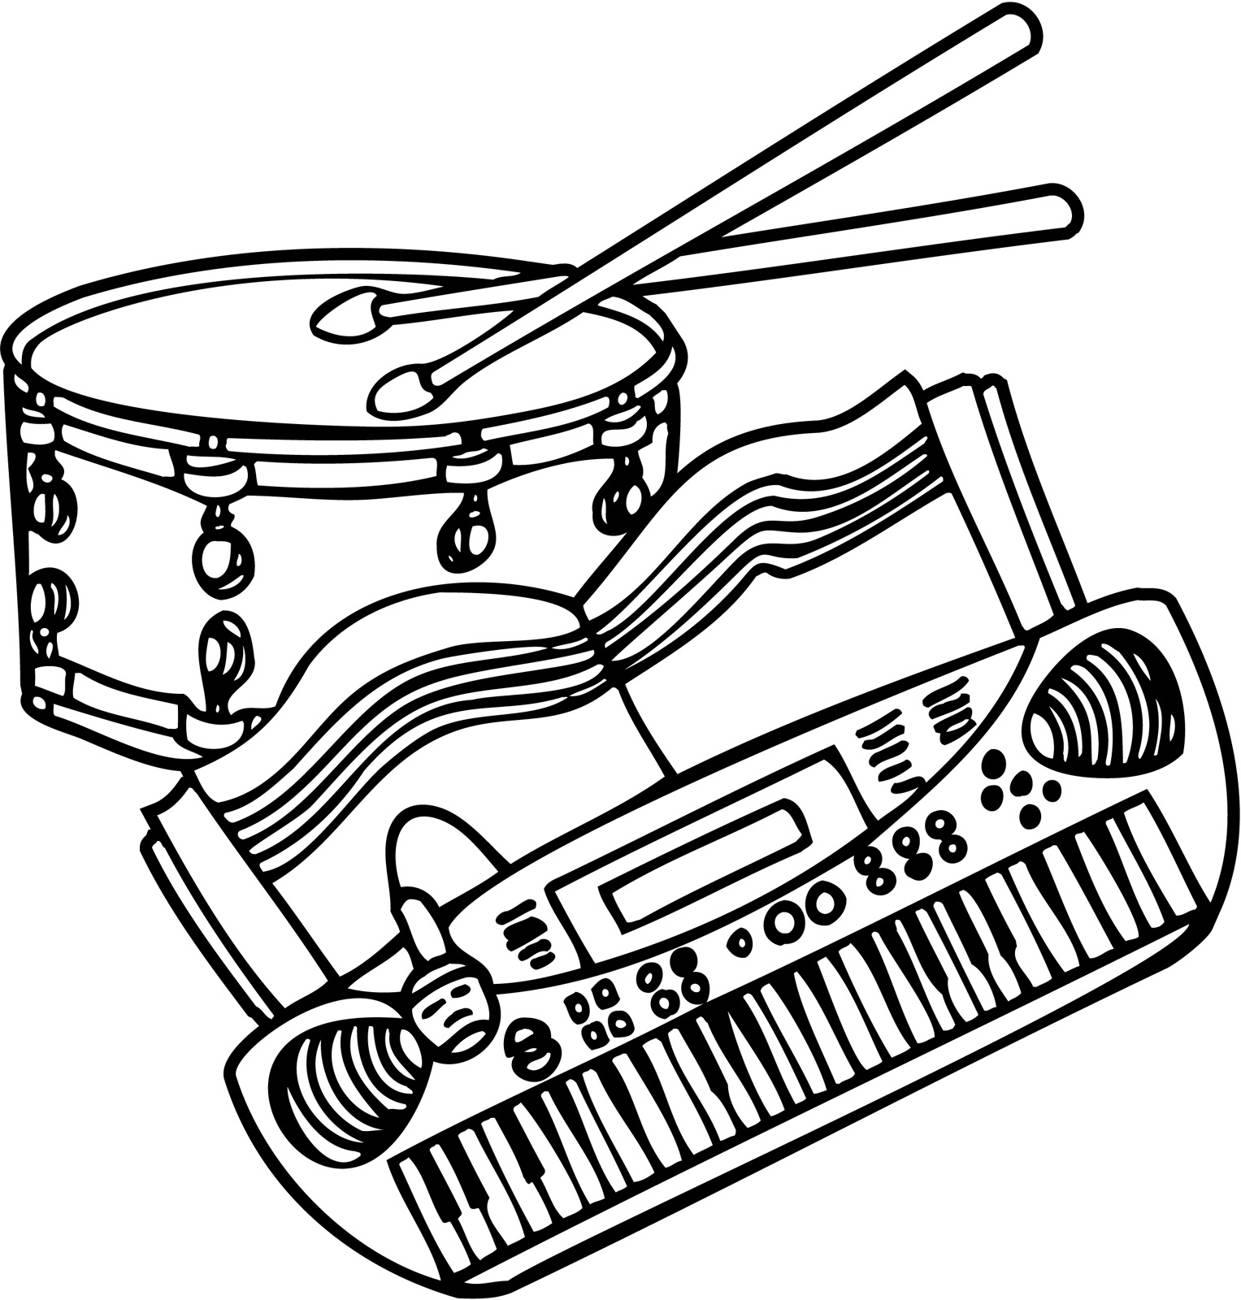 MUSIC-083